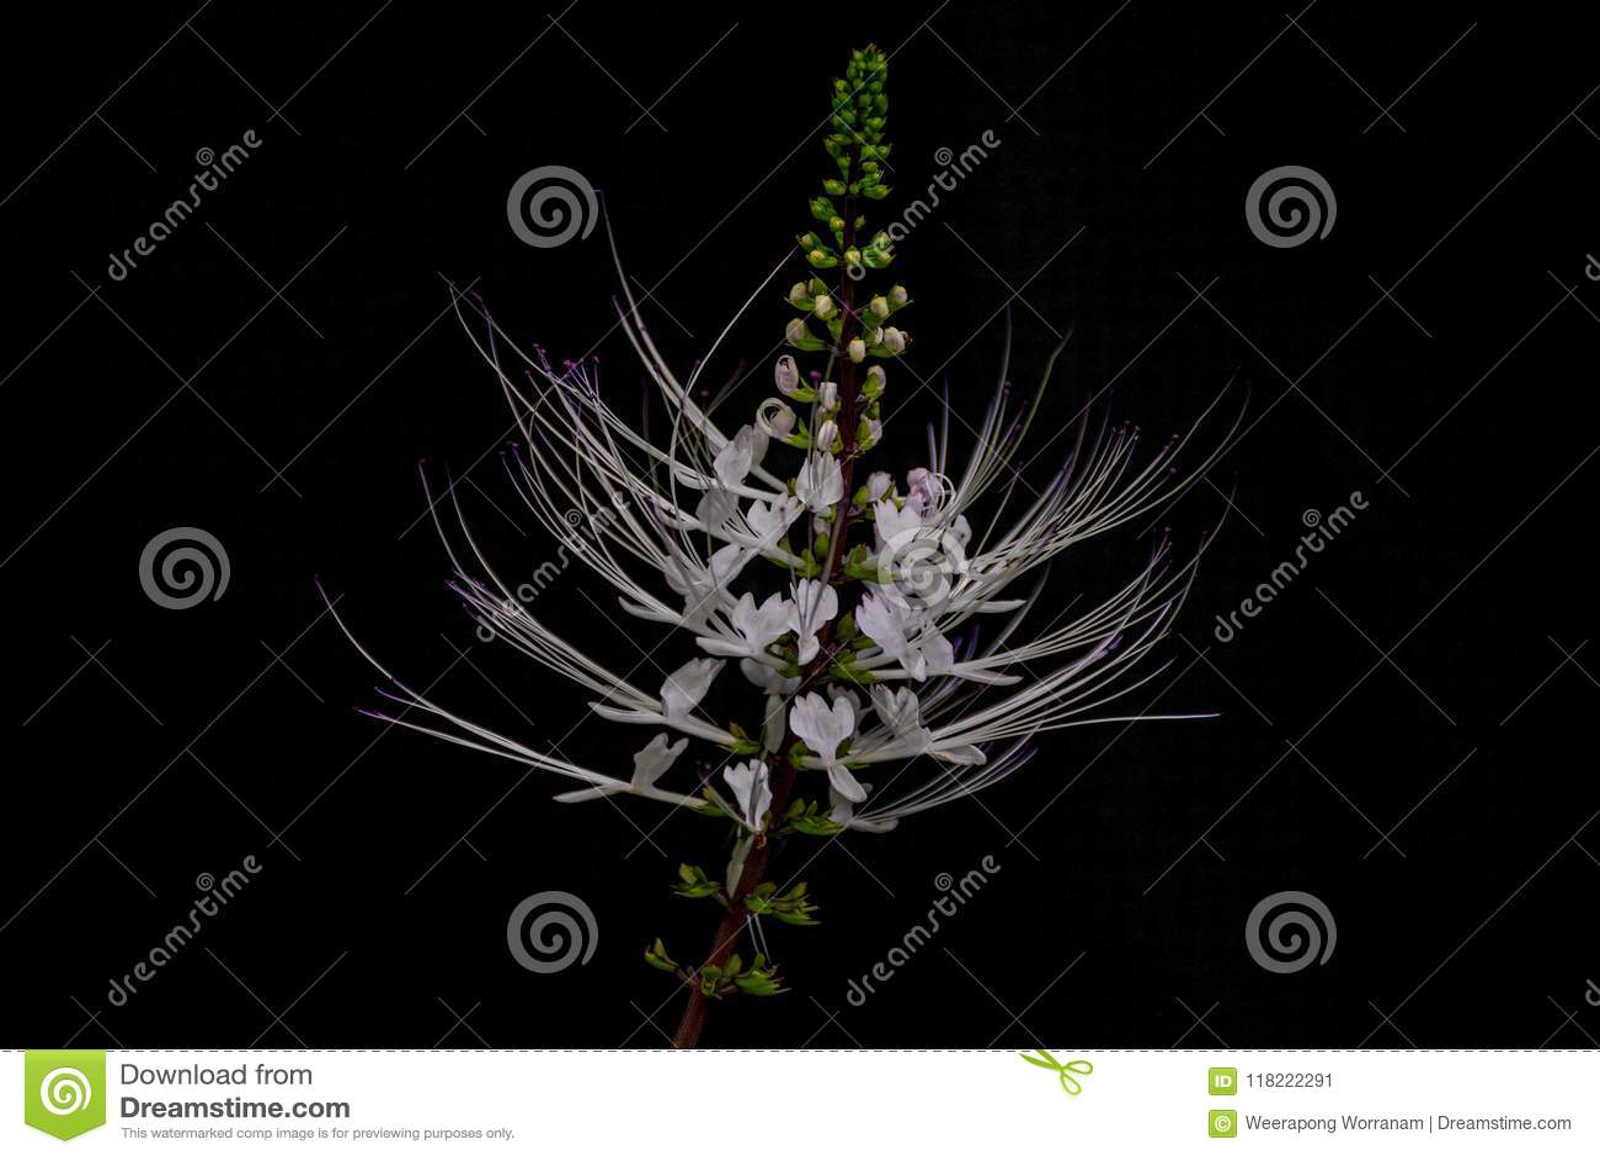 Java茶,肾脏茶厂, Cat's颊须, Orthosiphon aristatus,唇形科,唇形科,植物